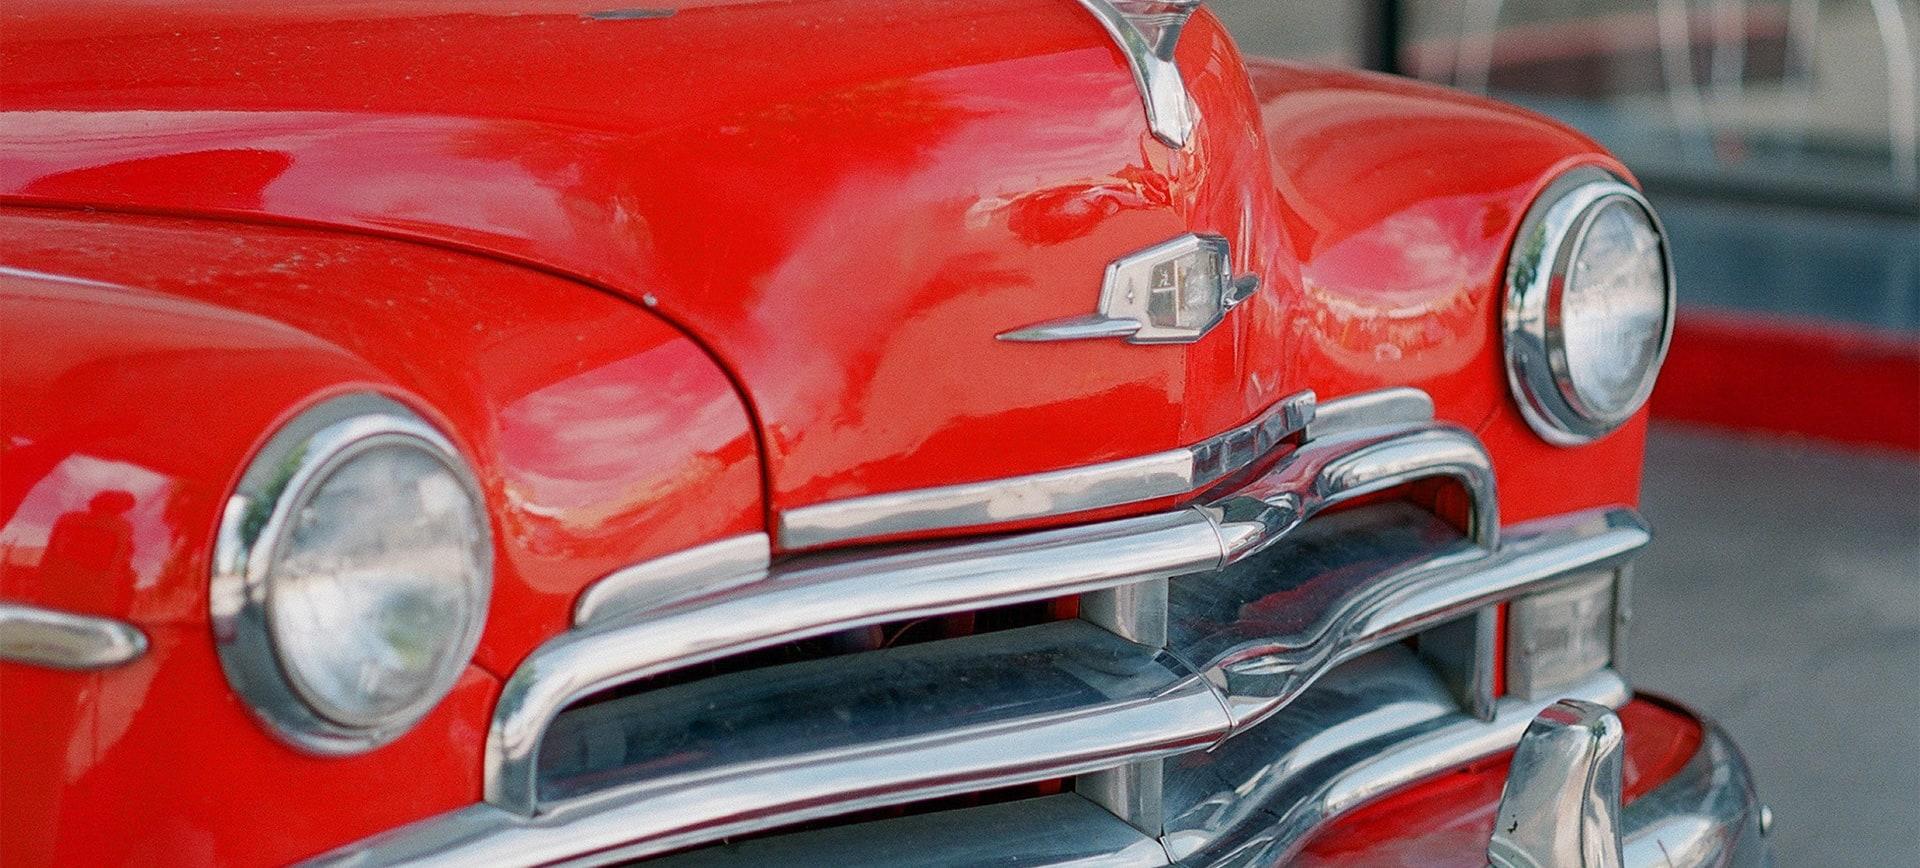 car-dealer-06